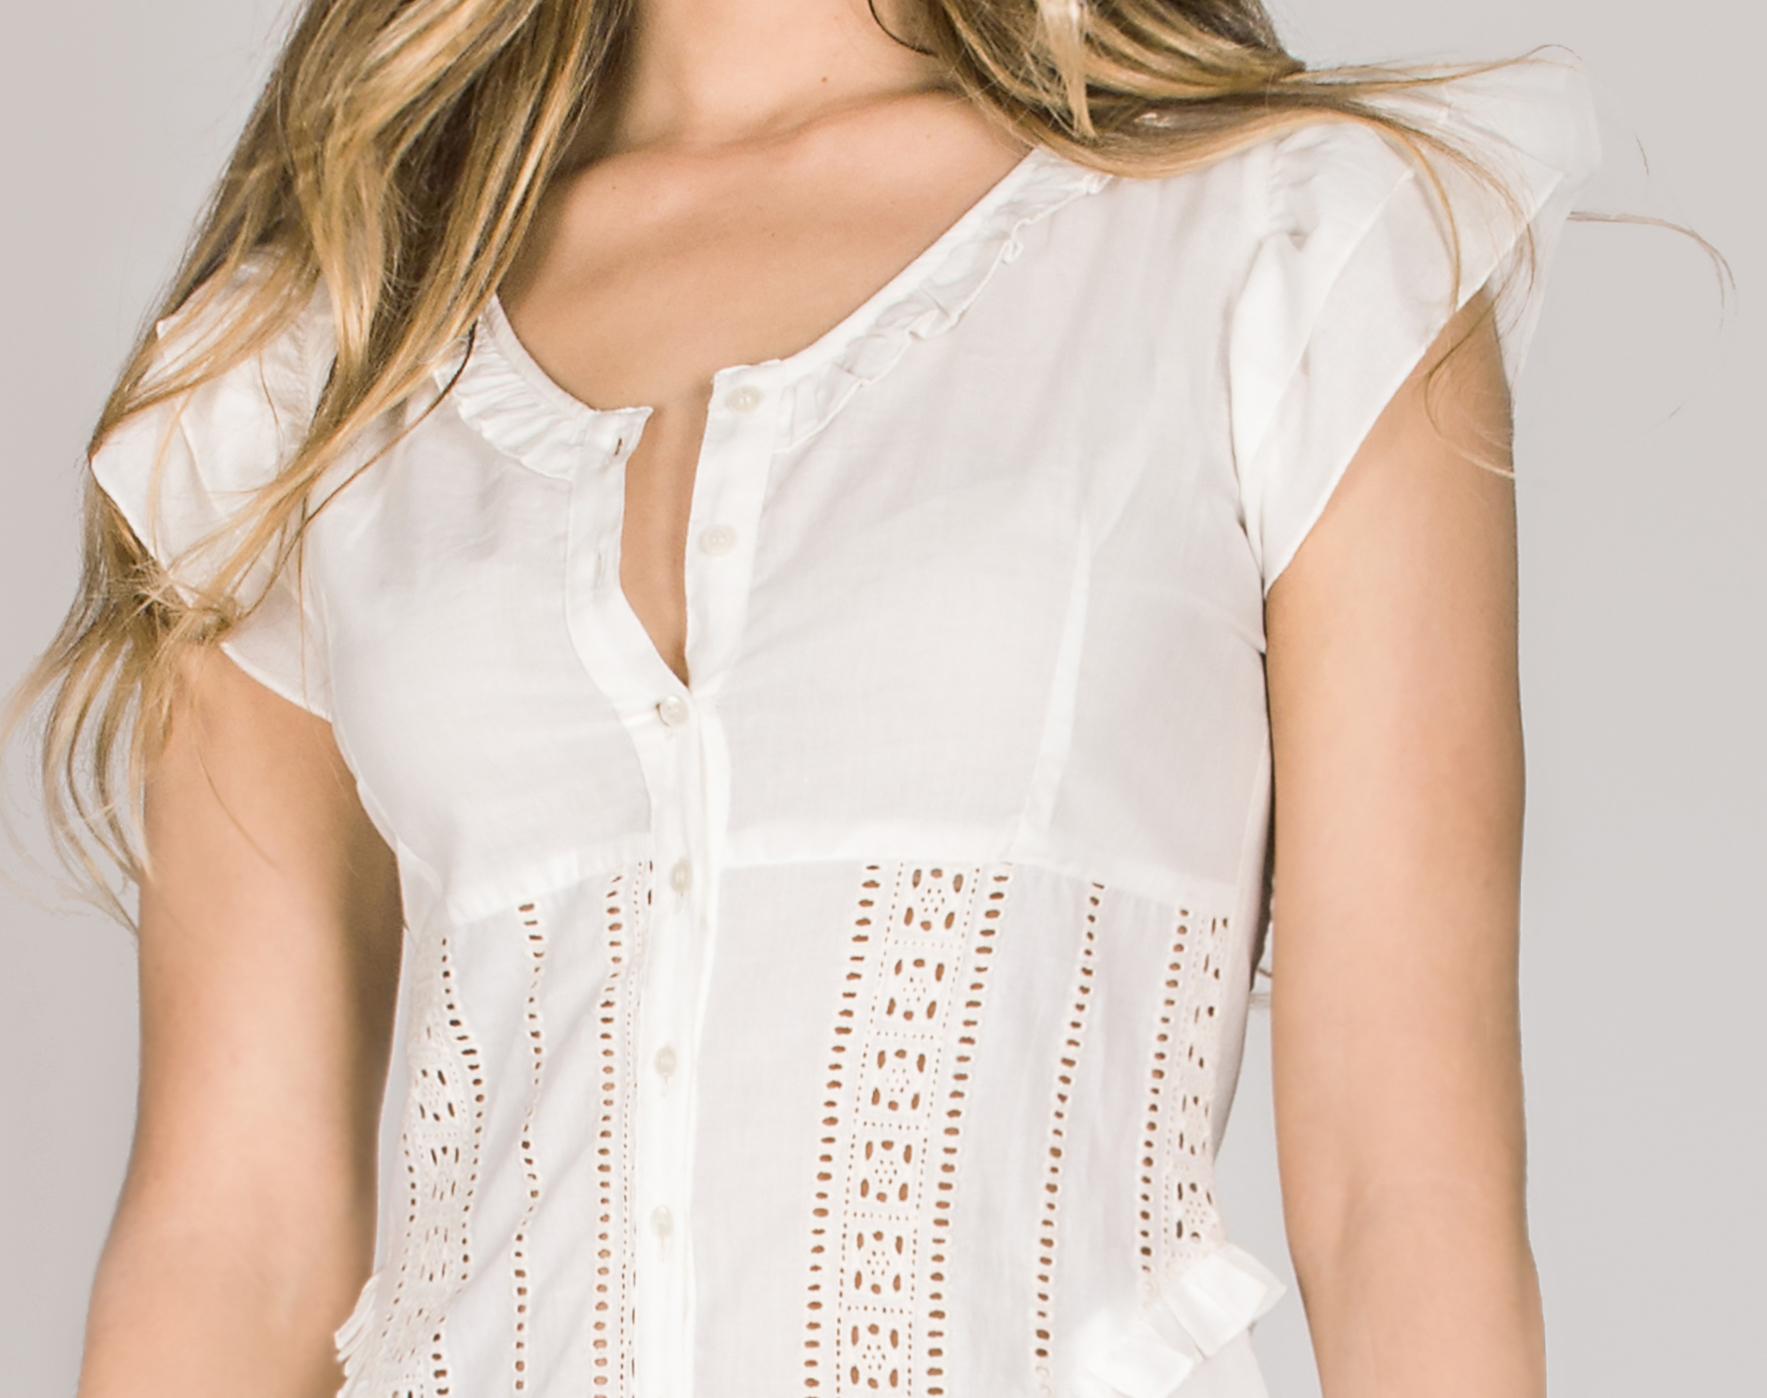 Shoklett Spain: Asymmetrical Princess Alysha Midi Dress SOLD OUT